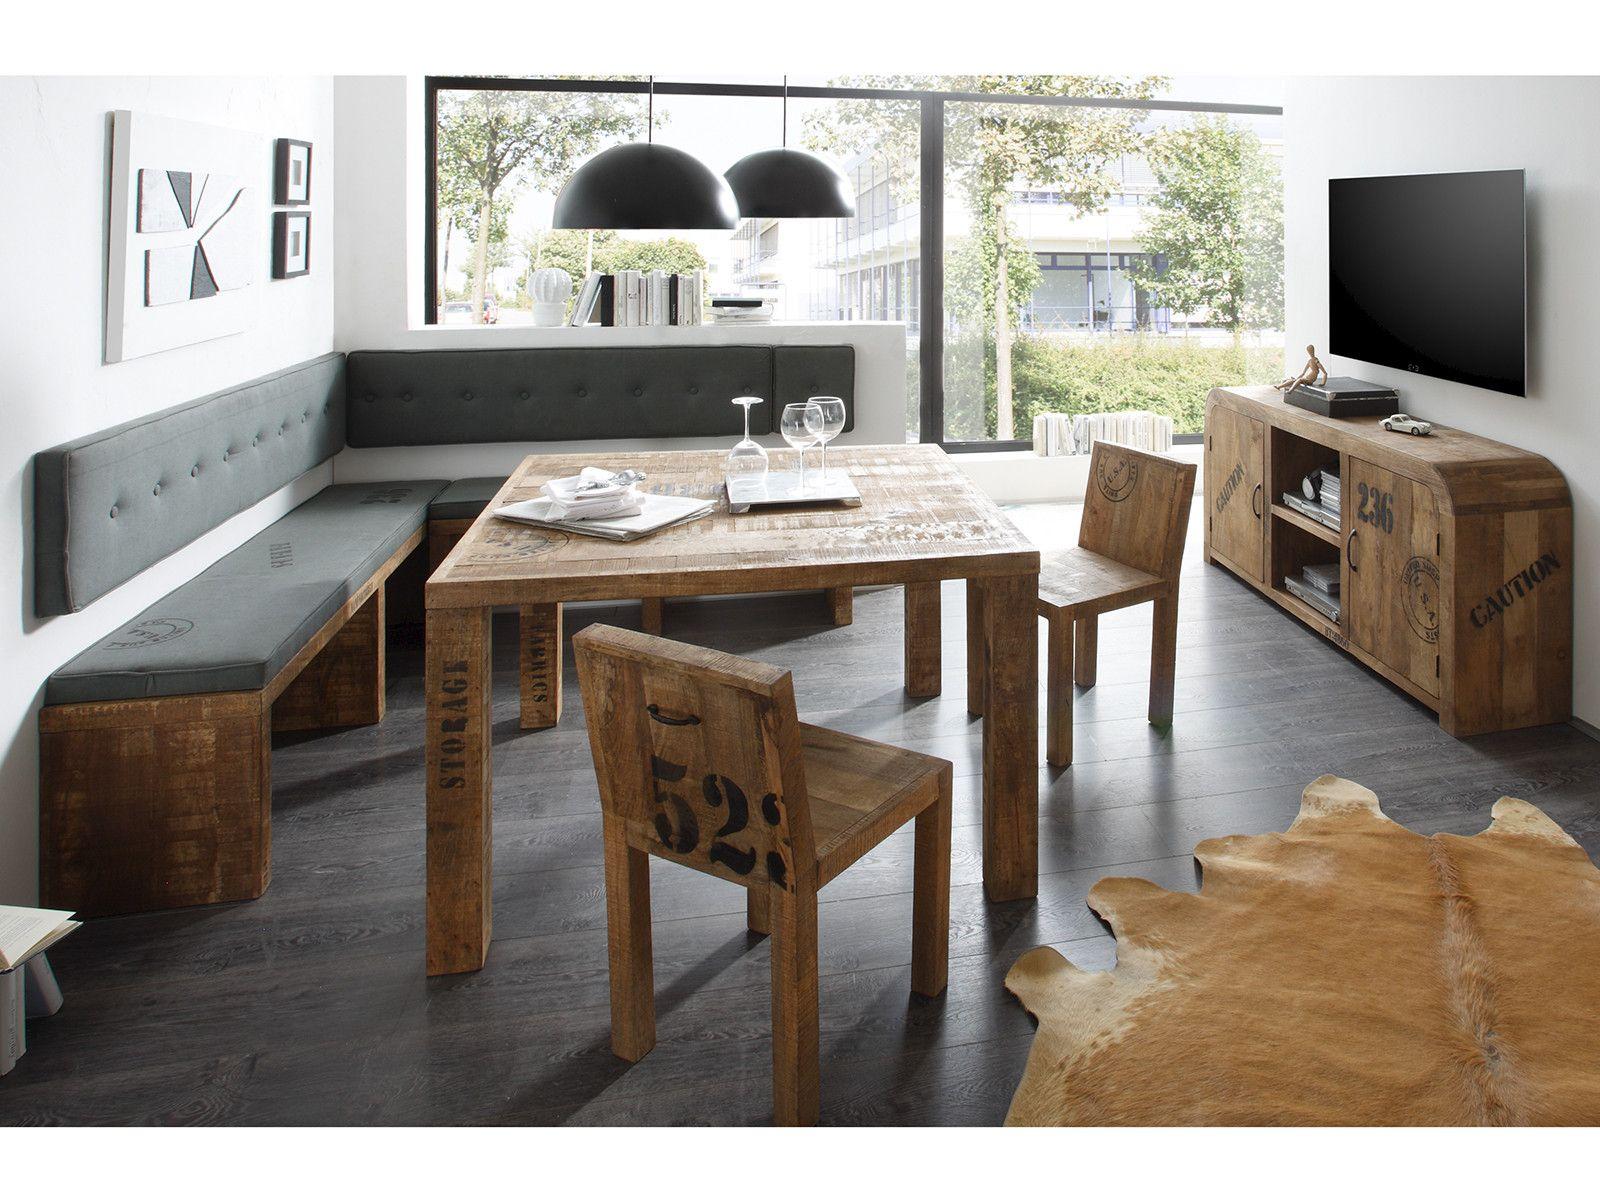 Elegant Nett Eckbank Designermöbel